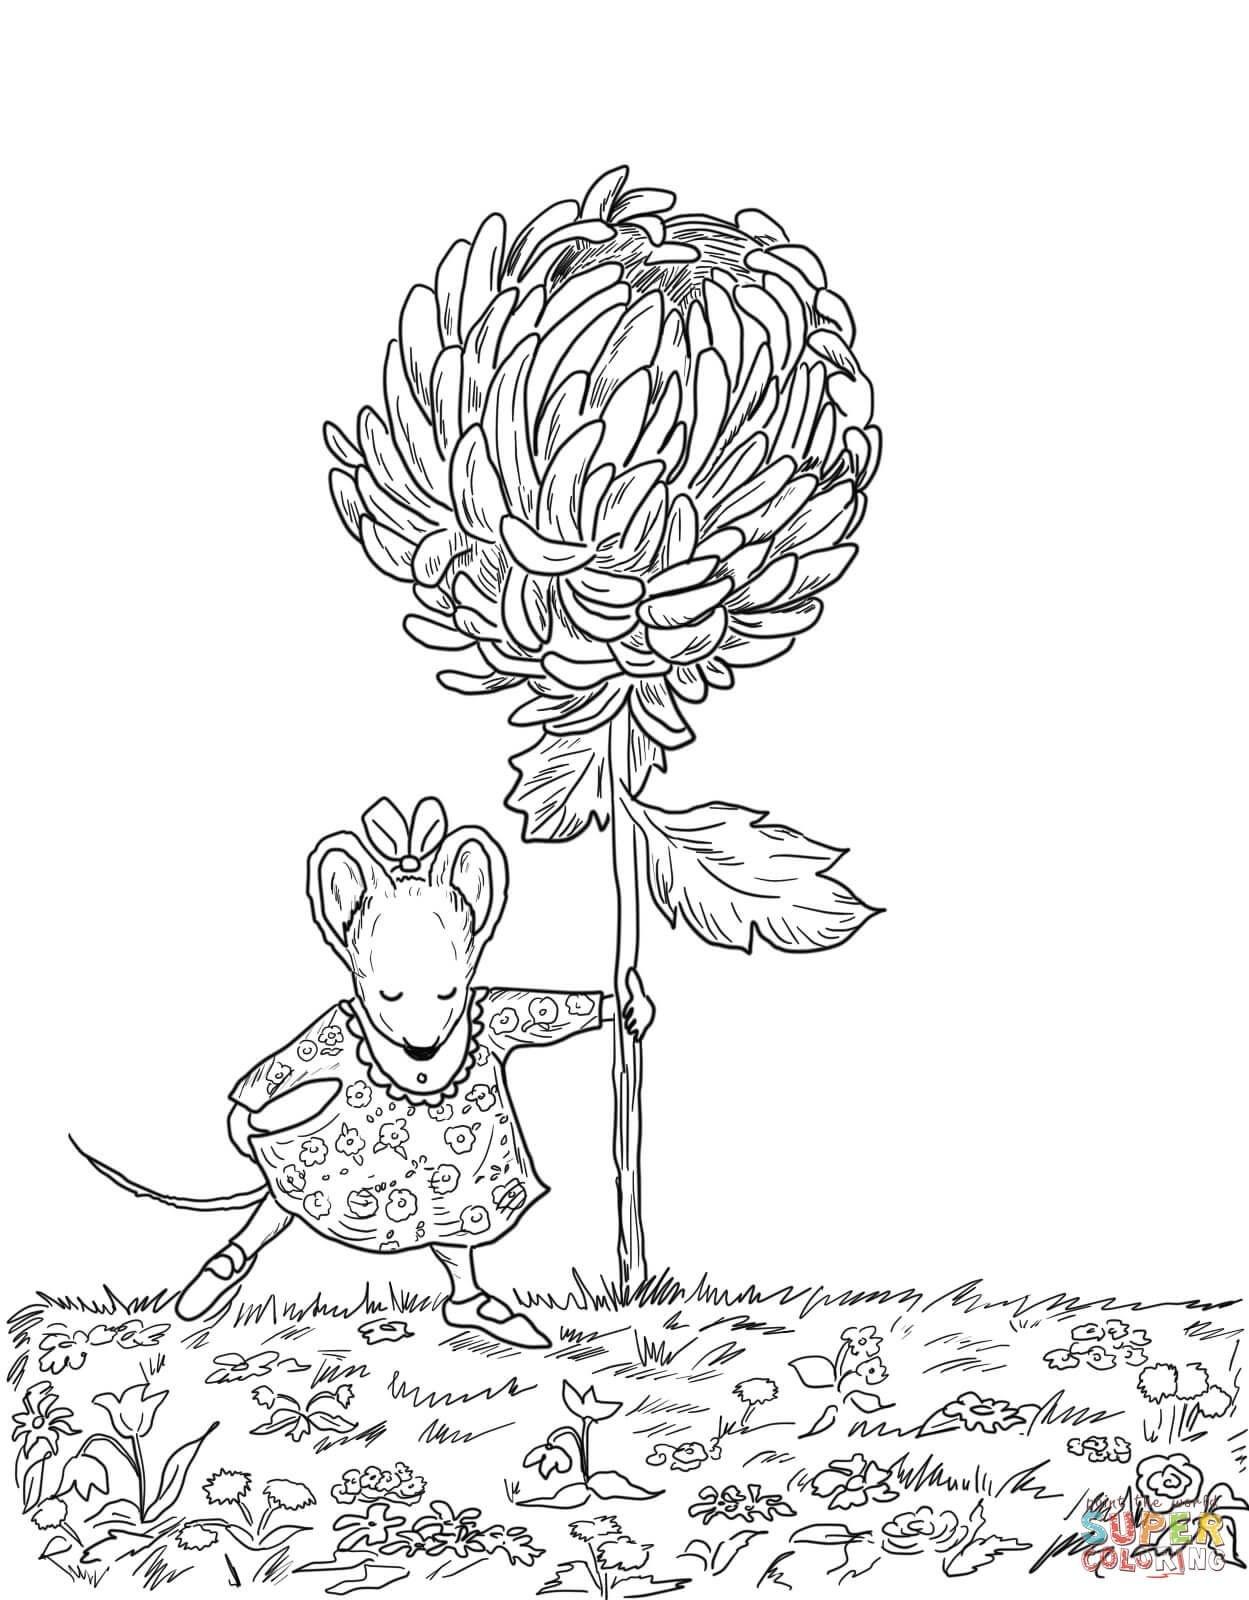 Chrysanthemum Coloring Page | Free Printable Coloring Pages | Just - Chrysanthemum Free Printable Activities